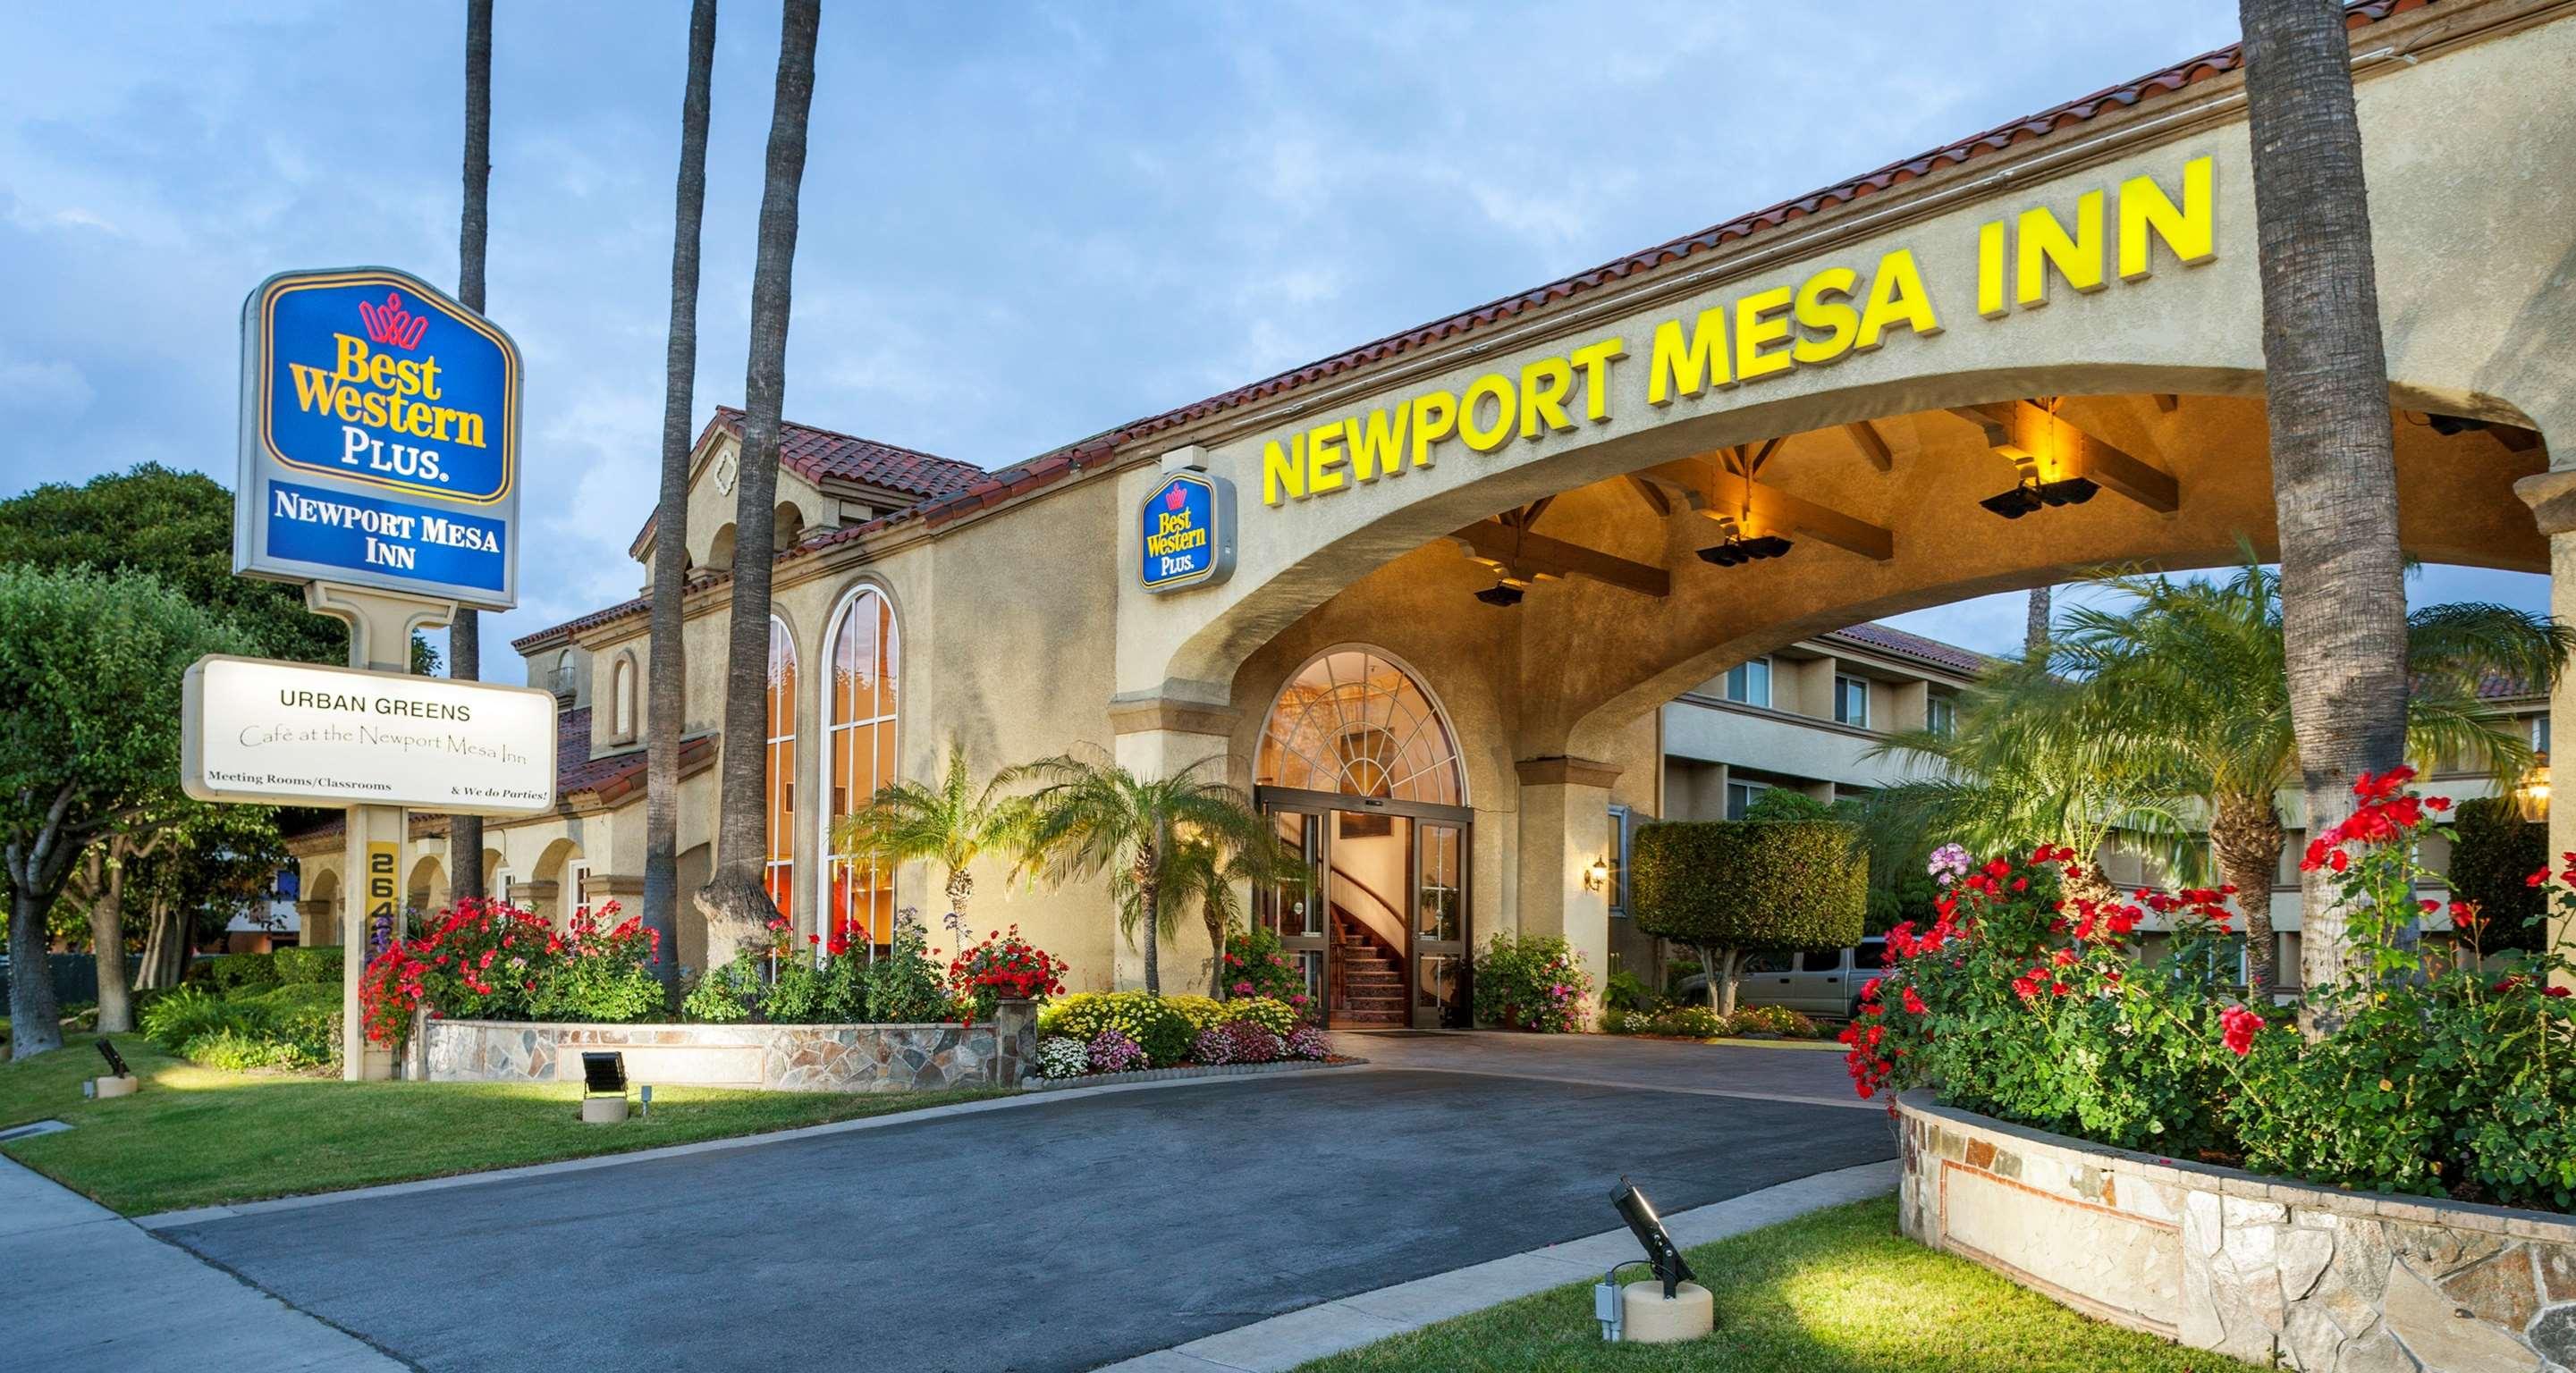 Best Western Plus Newport Mesa Inn In Costa Mesa Ca 92627